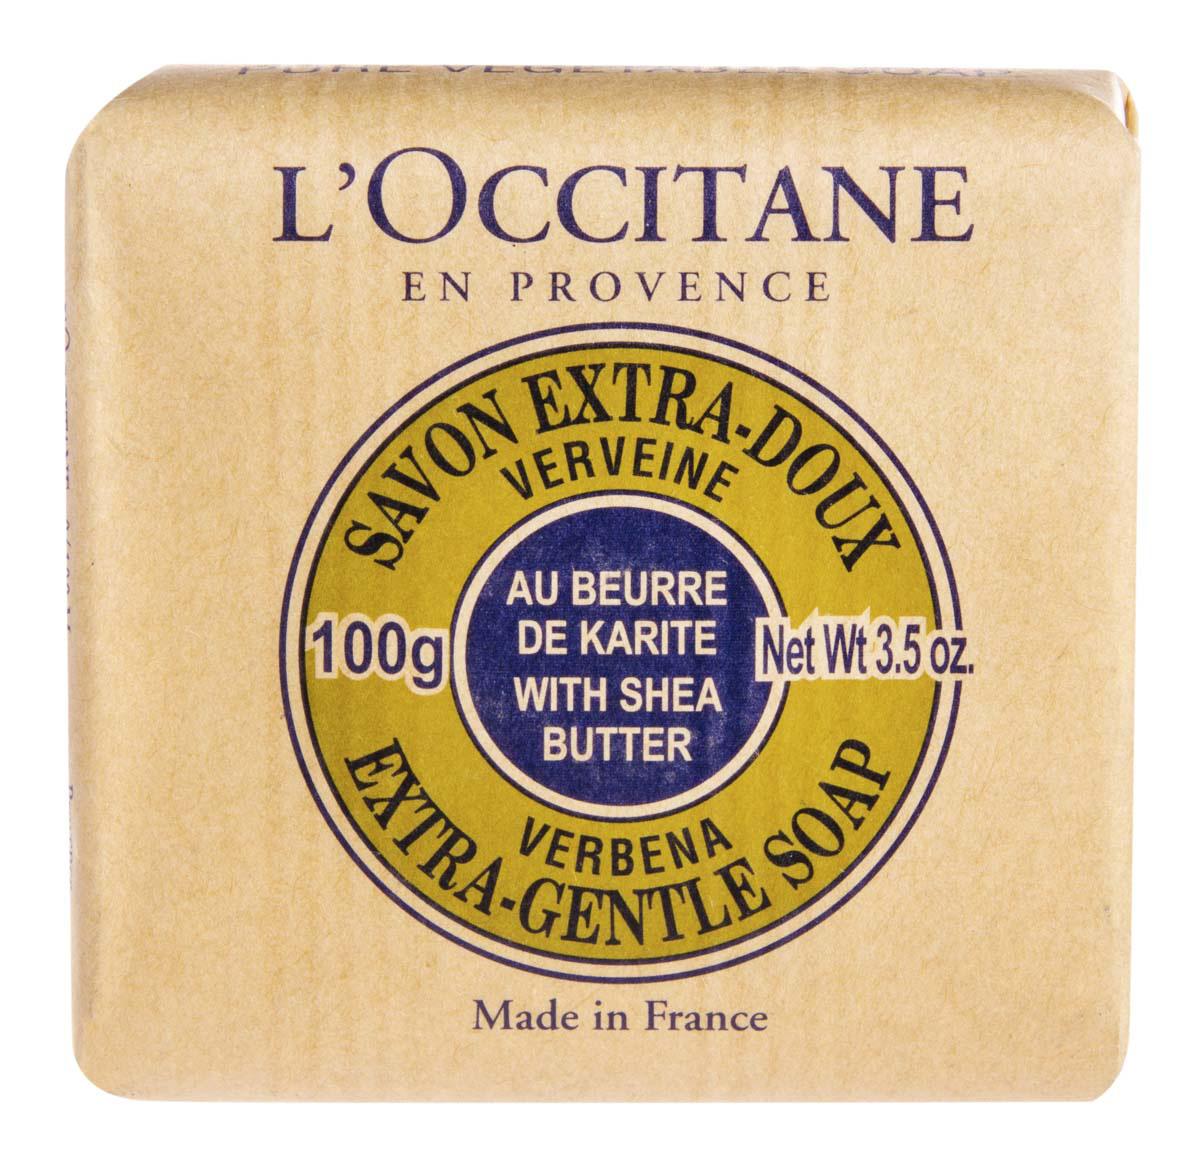 Sabonete Karité Verbena L'Occitane en Provence 100 g